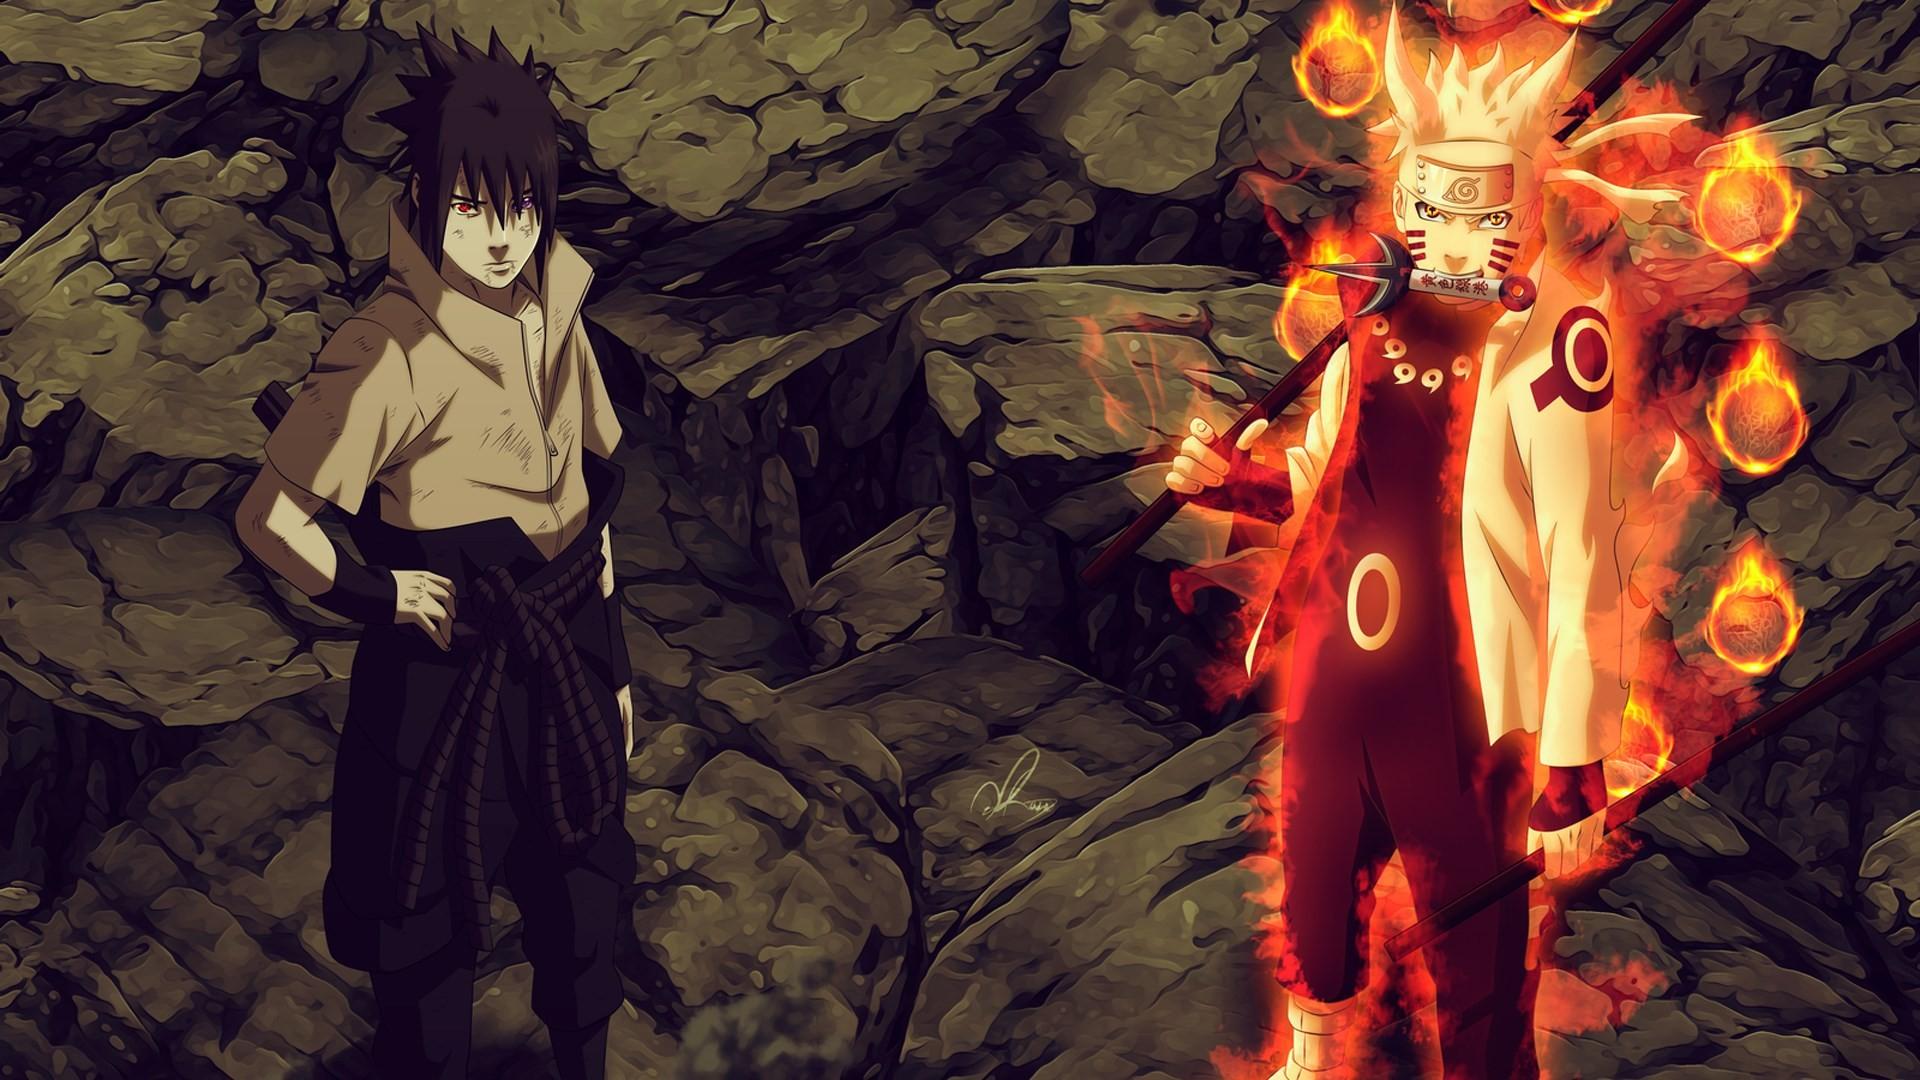 Naruto wallpaper 1920x1080 ·① Download free stunning full ...